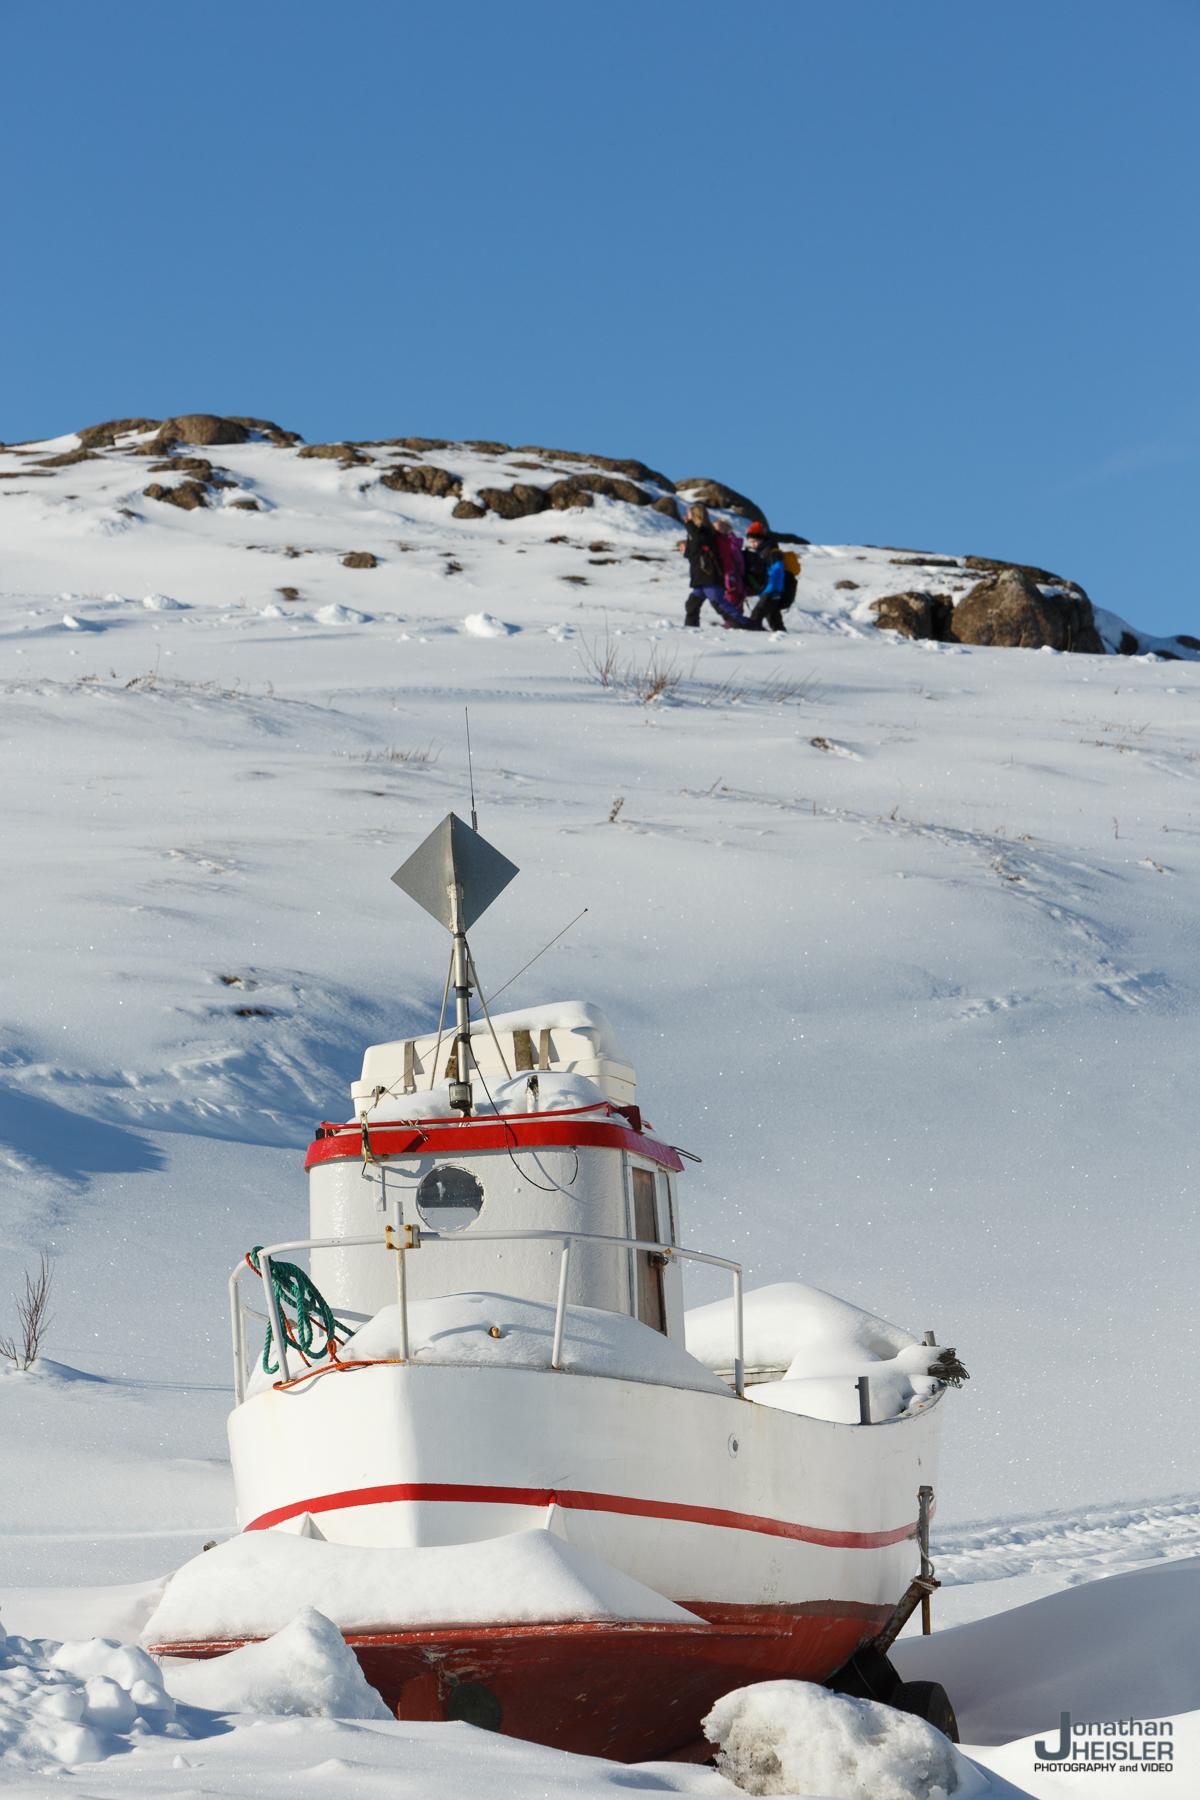 Iceland Winter Photos_  Jonathan Heisler __  02292016 _ 067.jpg